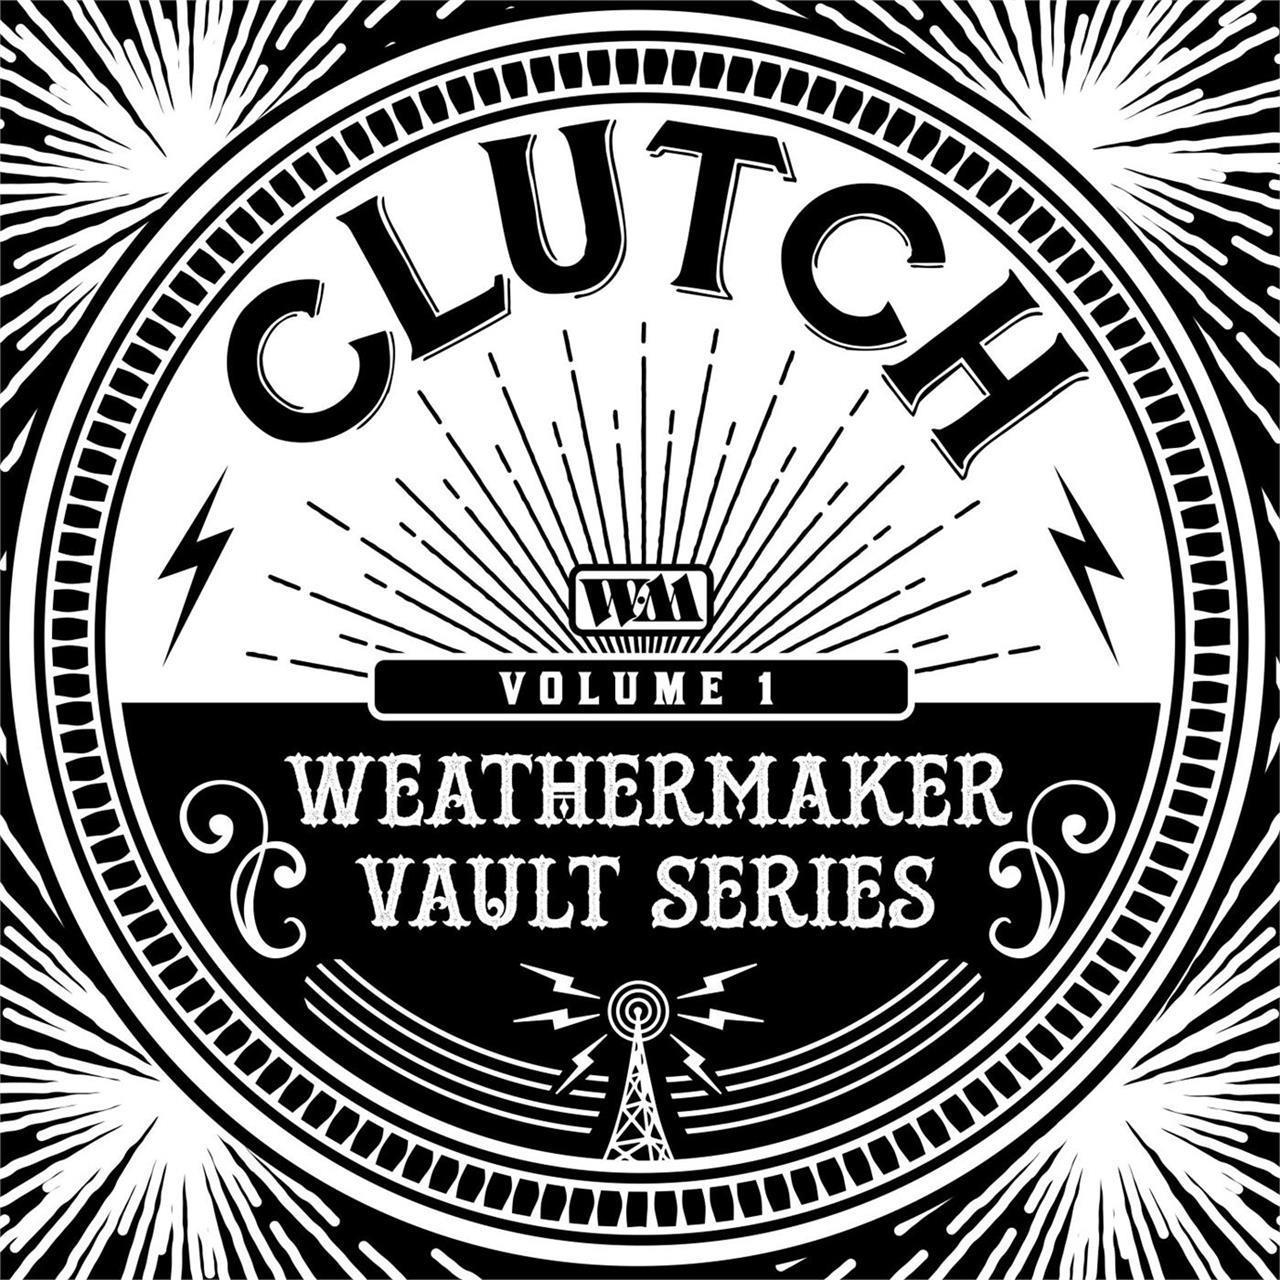 Clutch - The Weathermaker Vault Series Vol. 1 [LP] (White Vinyl)